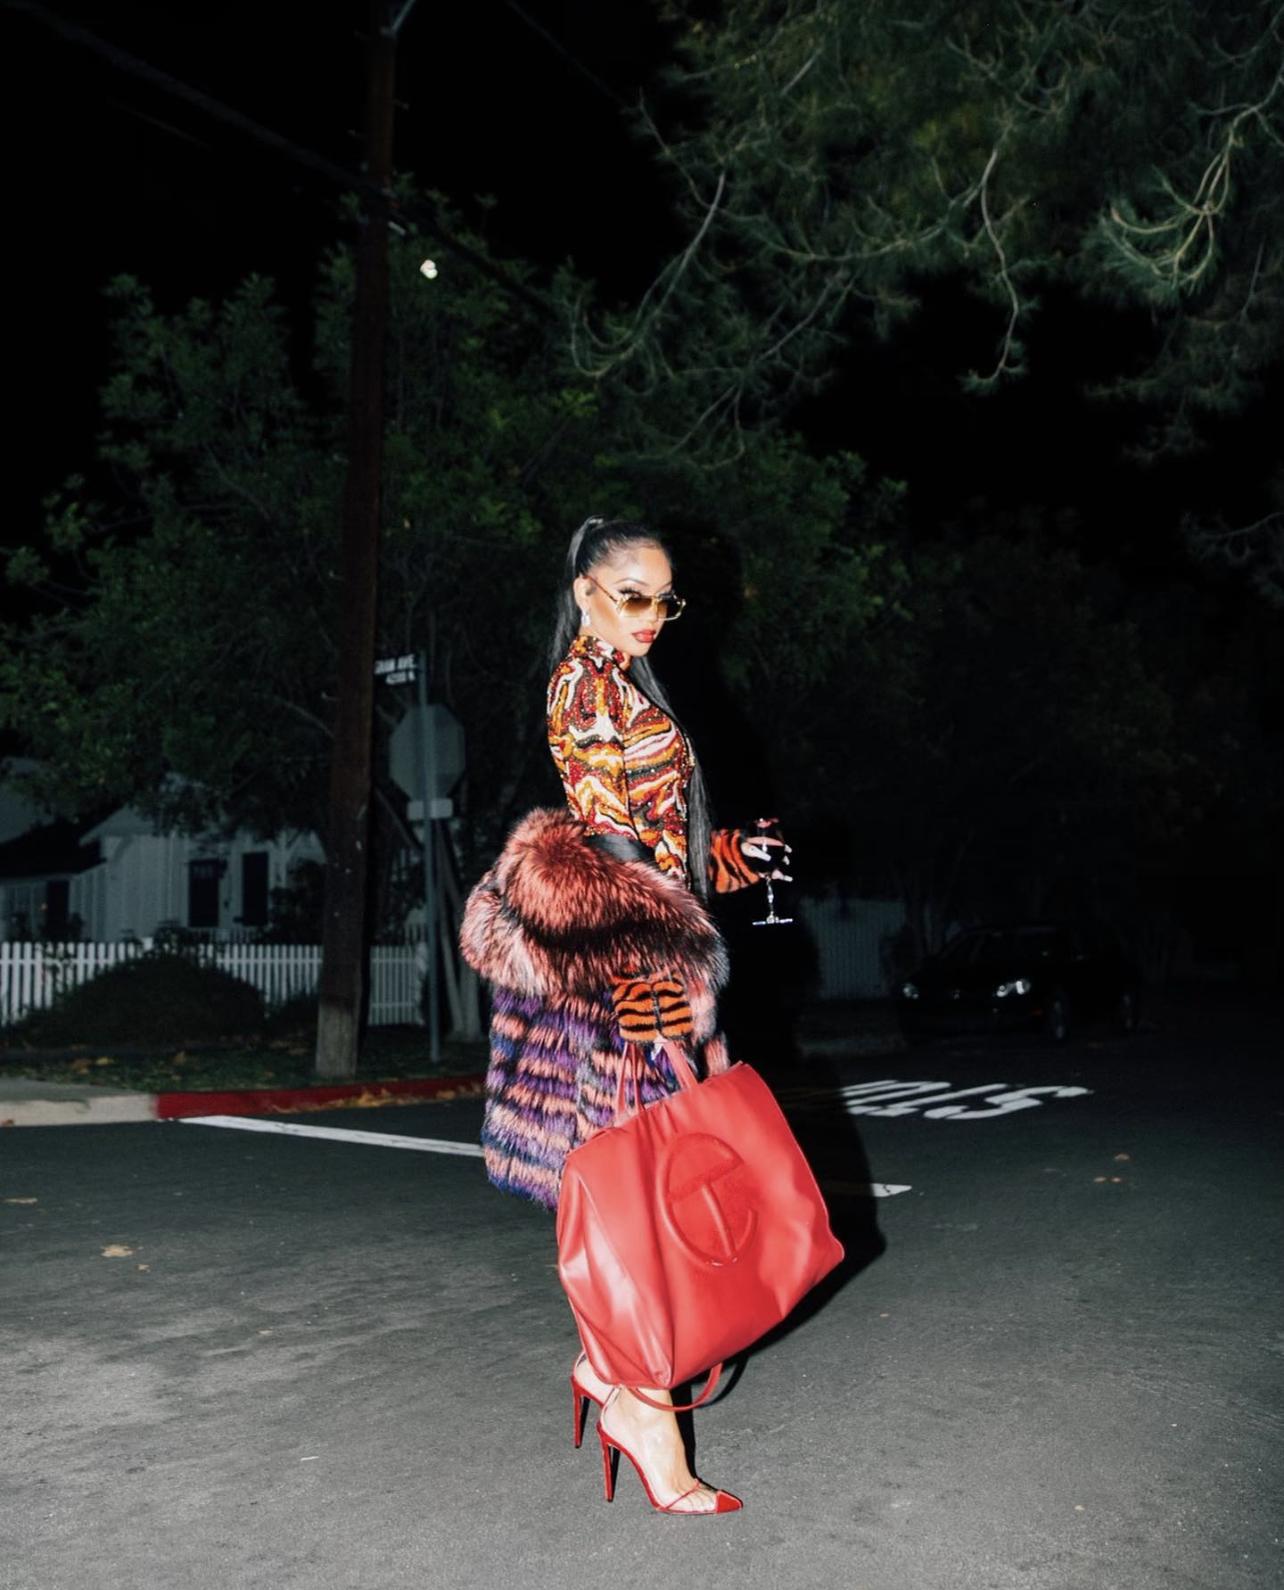 saweetie-wore-elie-madi-dress-celebrating-new-year-2021